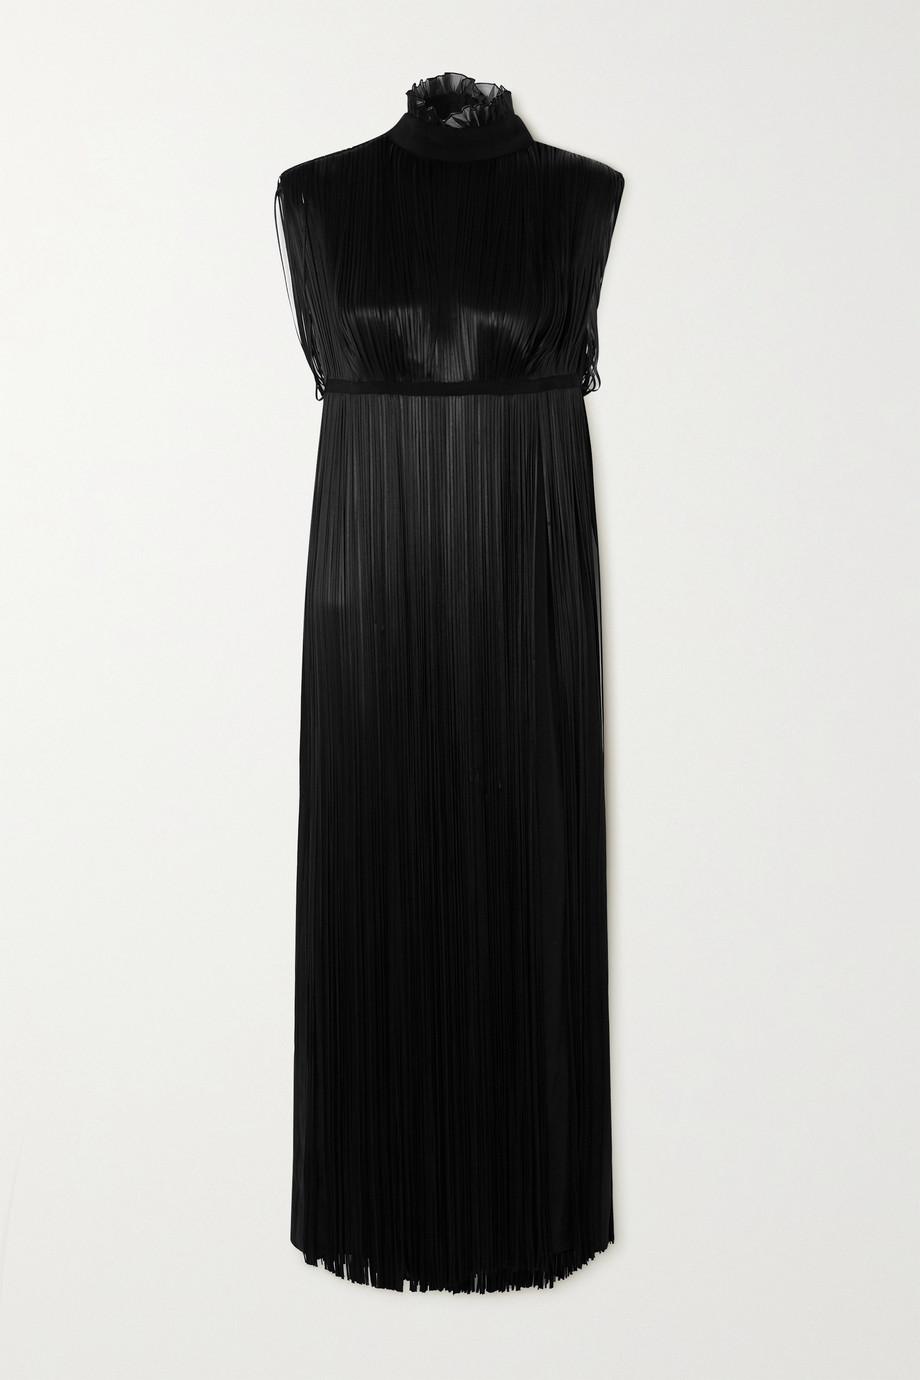 Prada Fringed silk crepe de chine maxi dress